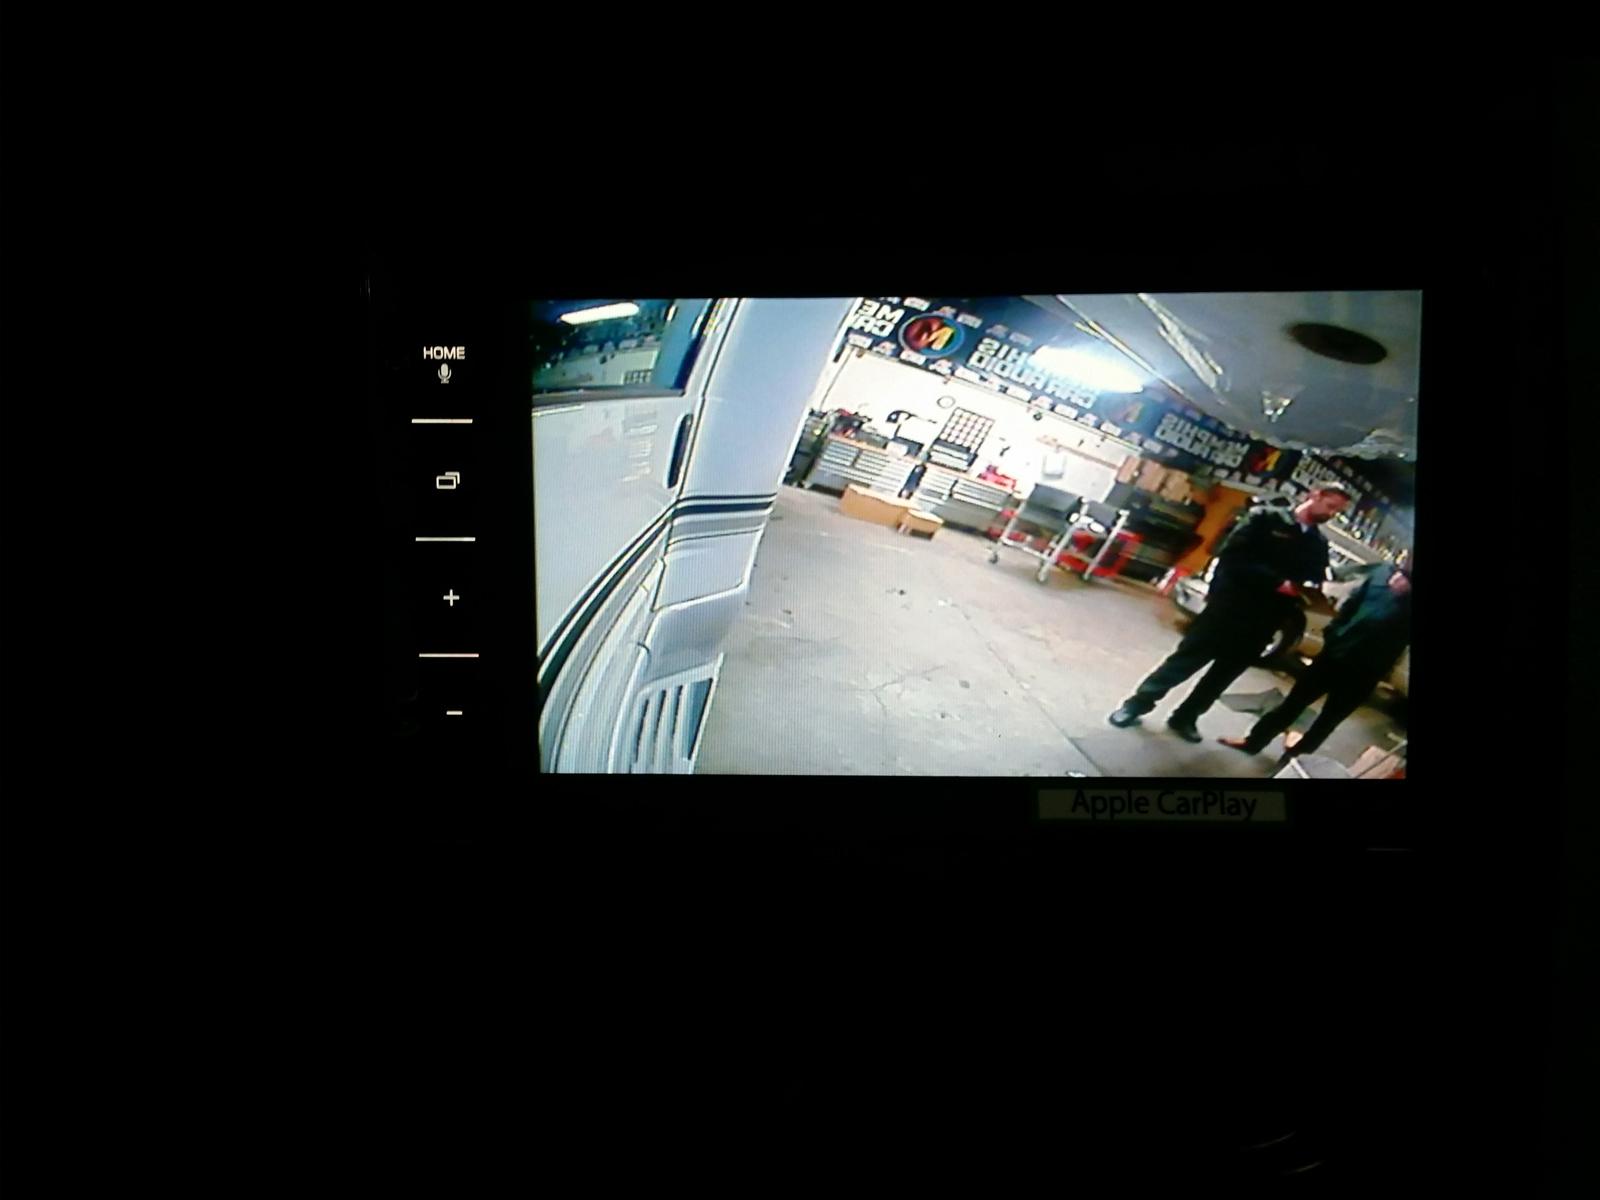 RV Complete Camera System